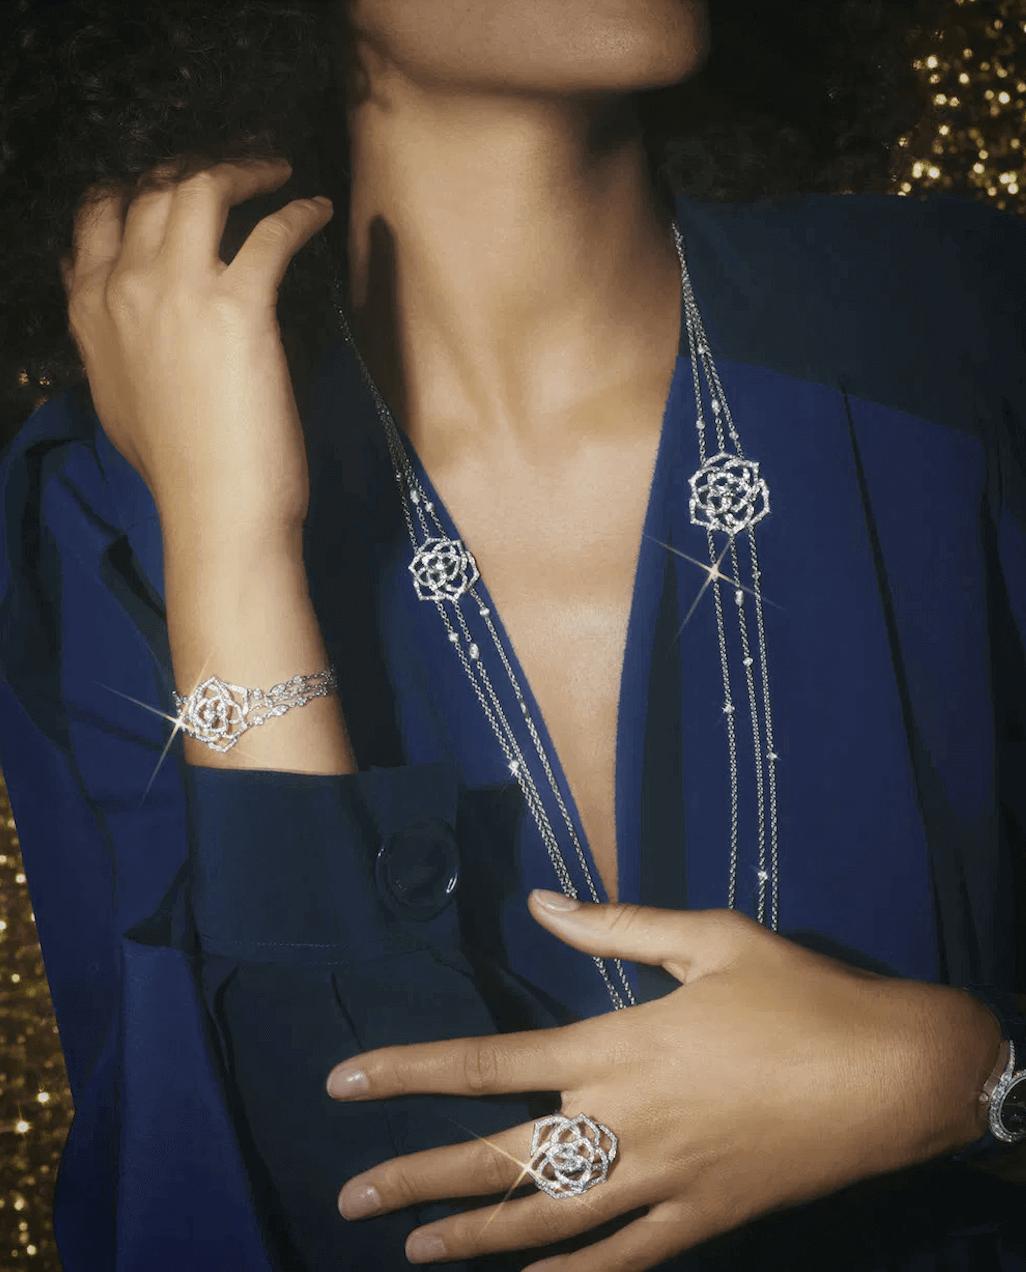 piaget altiplano mücevher koleksiyon foto